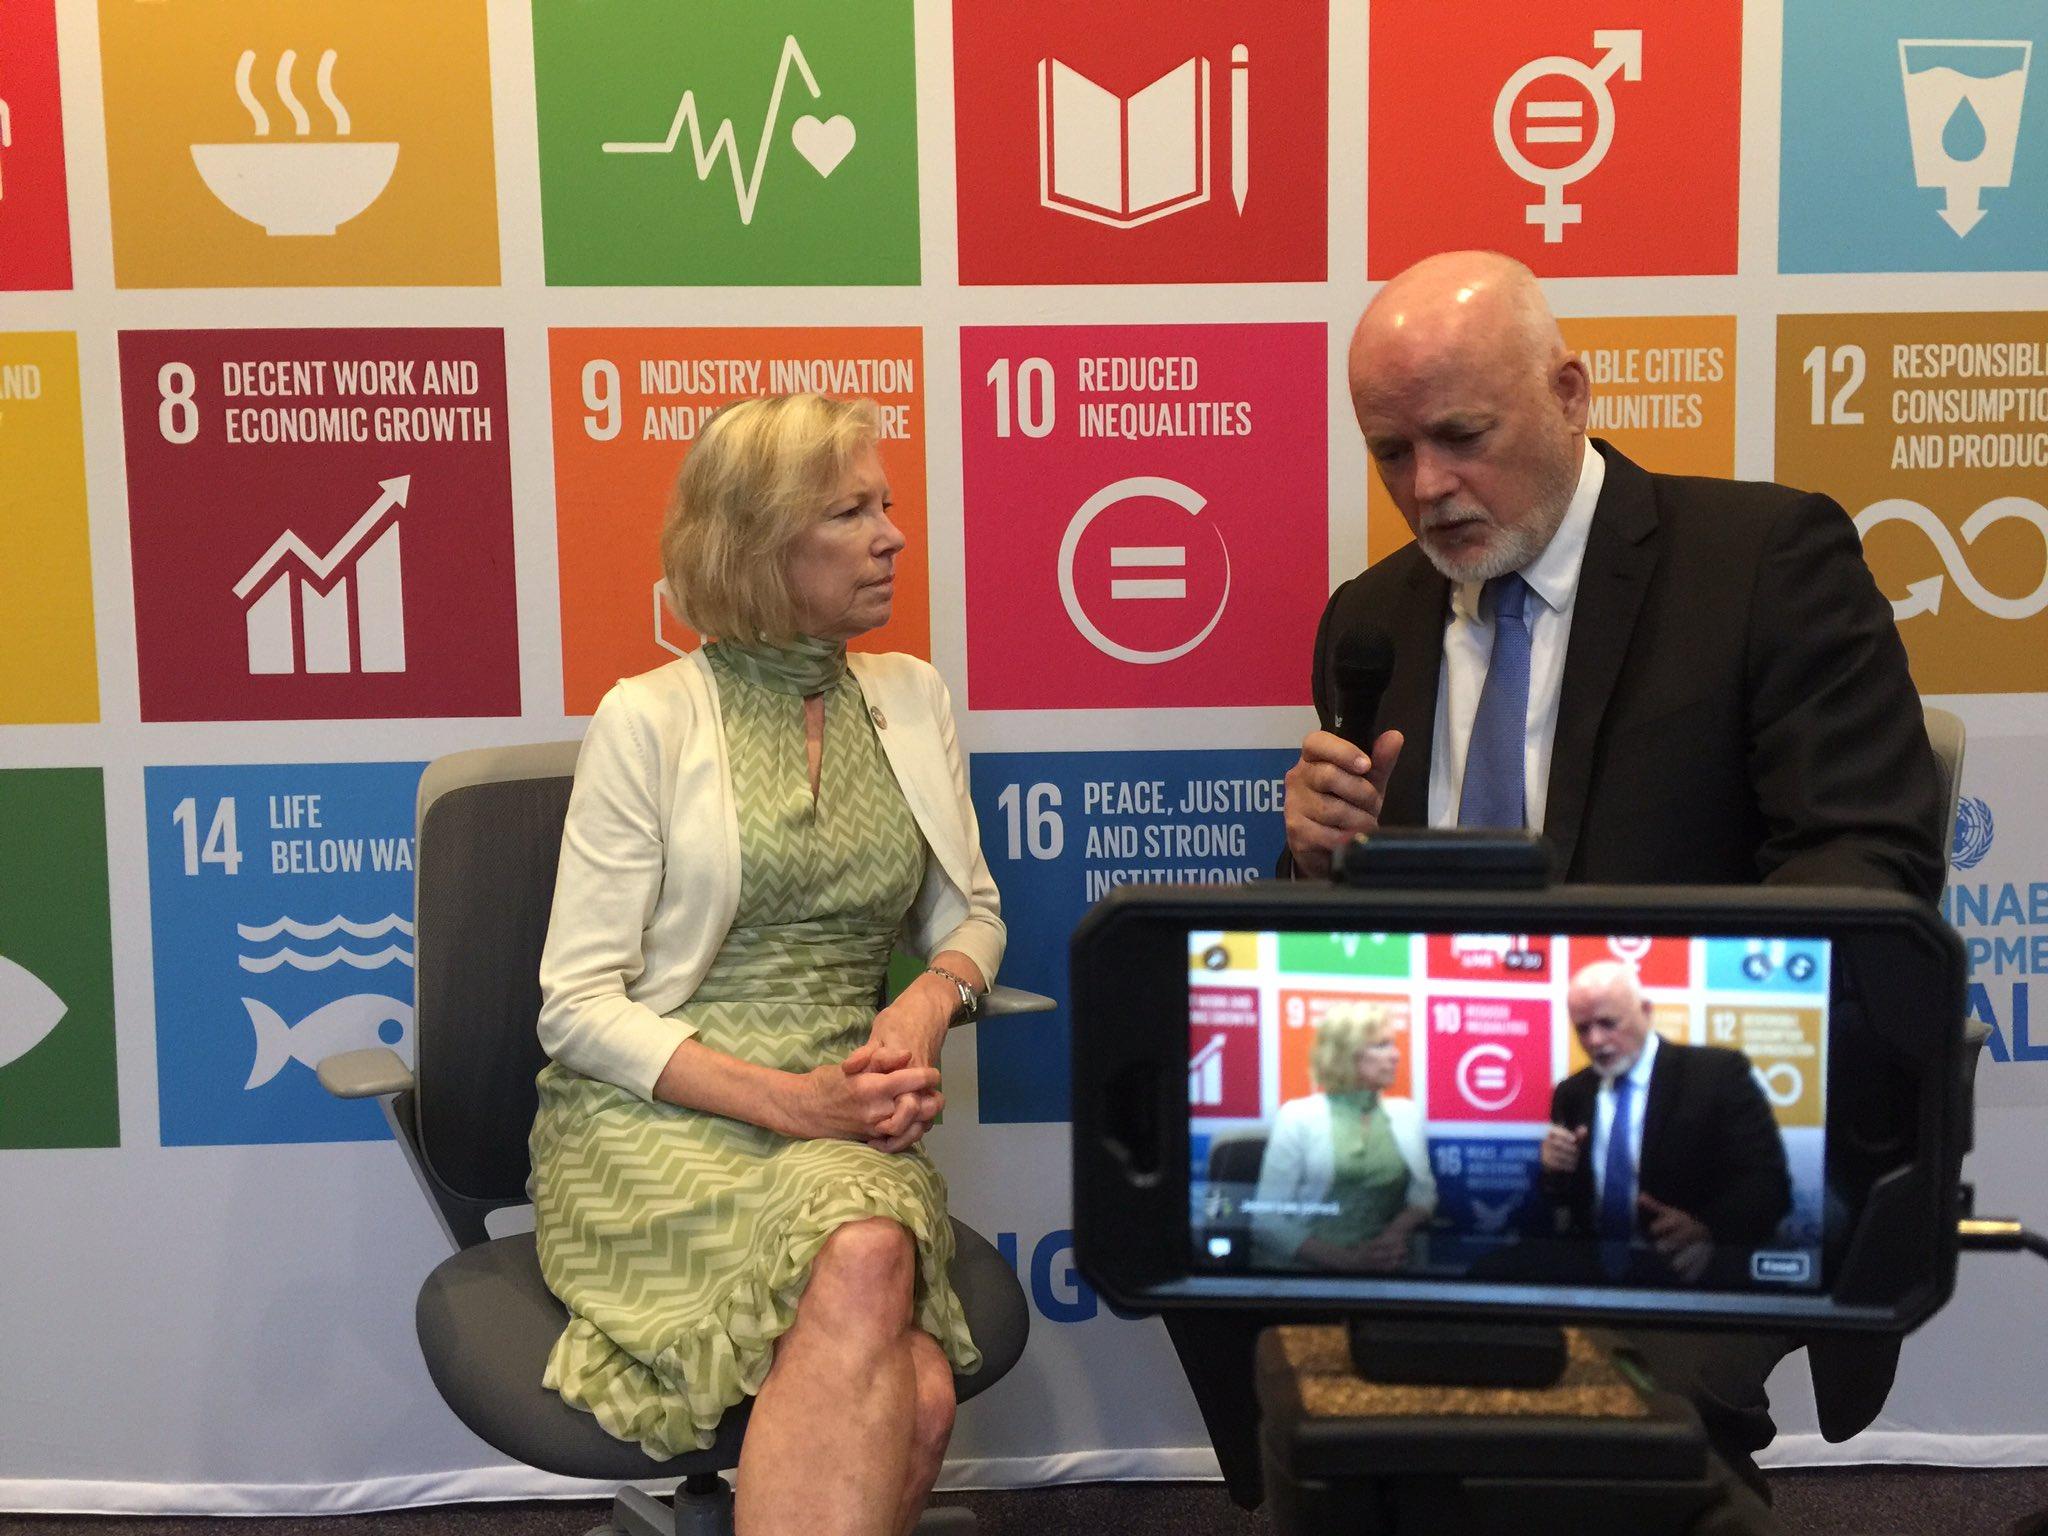 WATCH: @UN_PGA & @Kathy_Calvin discuss value of citizen leadership to solve global challenges: https://t.co/mXBoNo2MrZ #USAforUN w/ @UNAUSA https://t.co/HtZZ1Btuqs